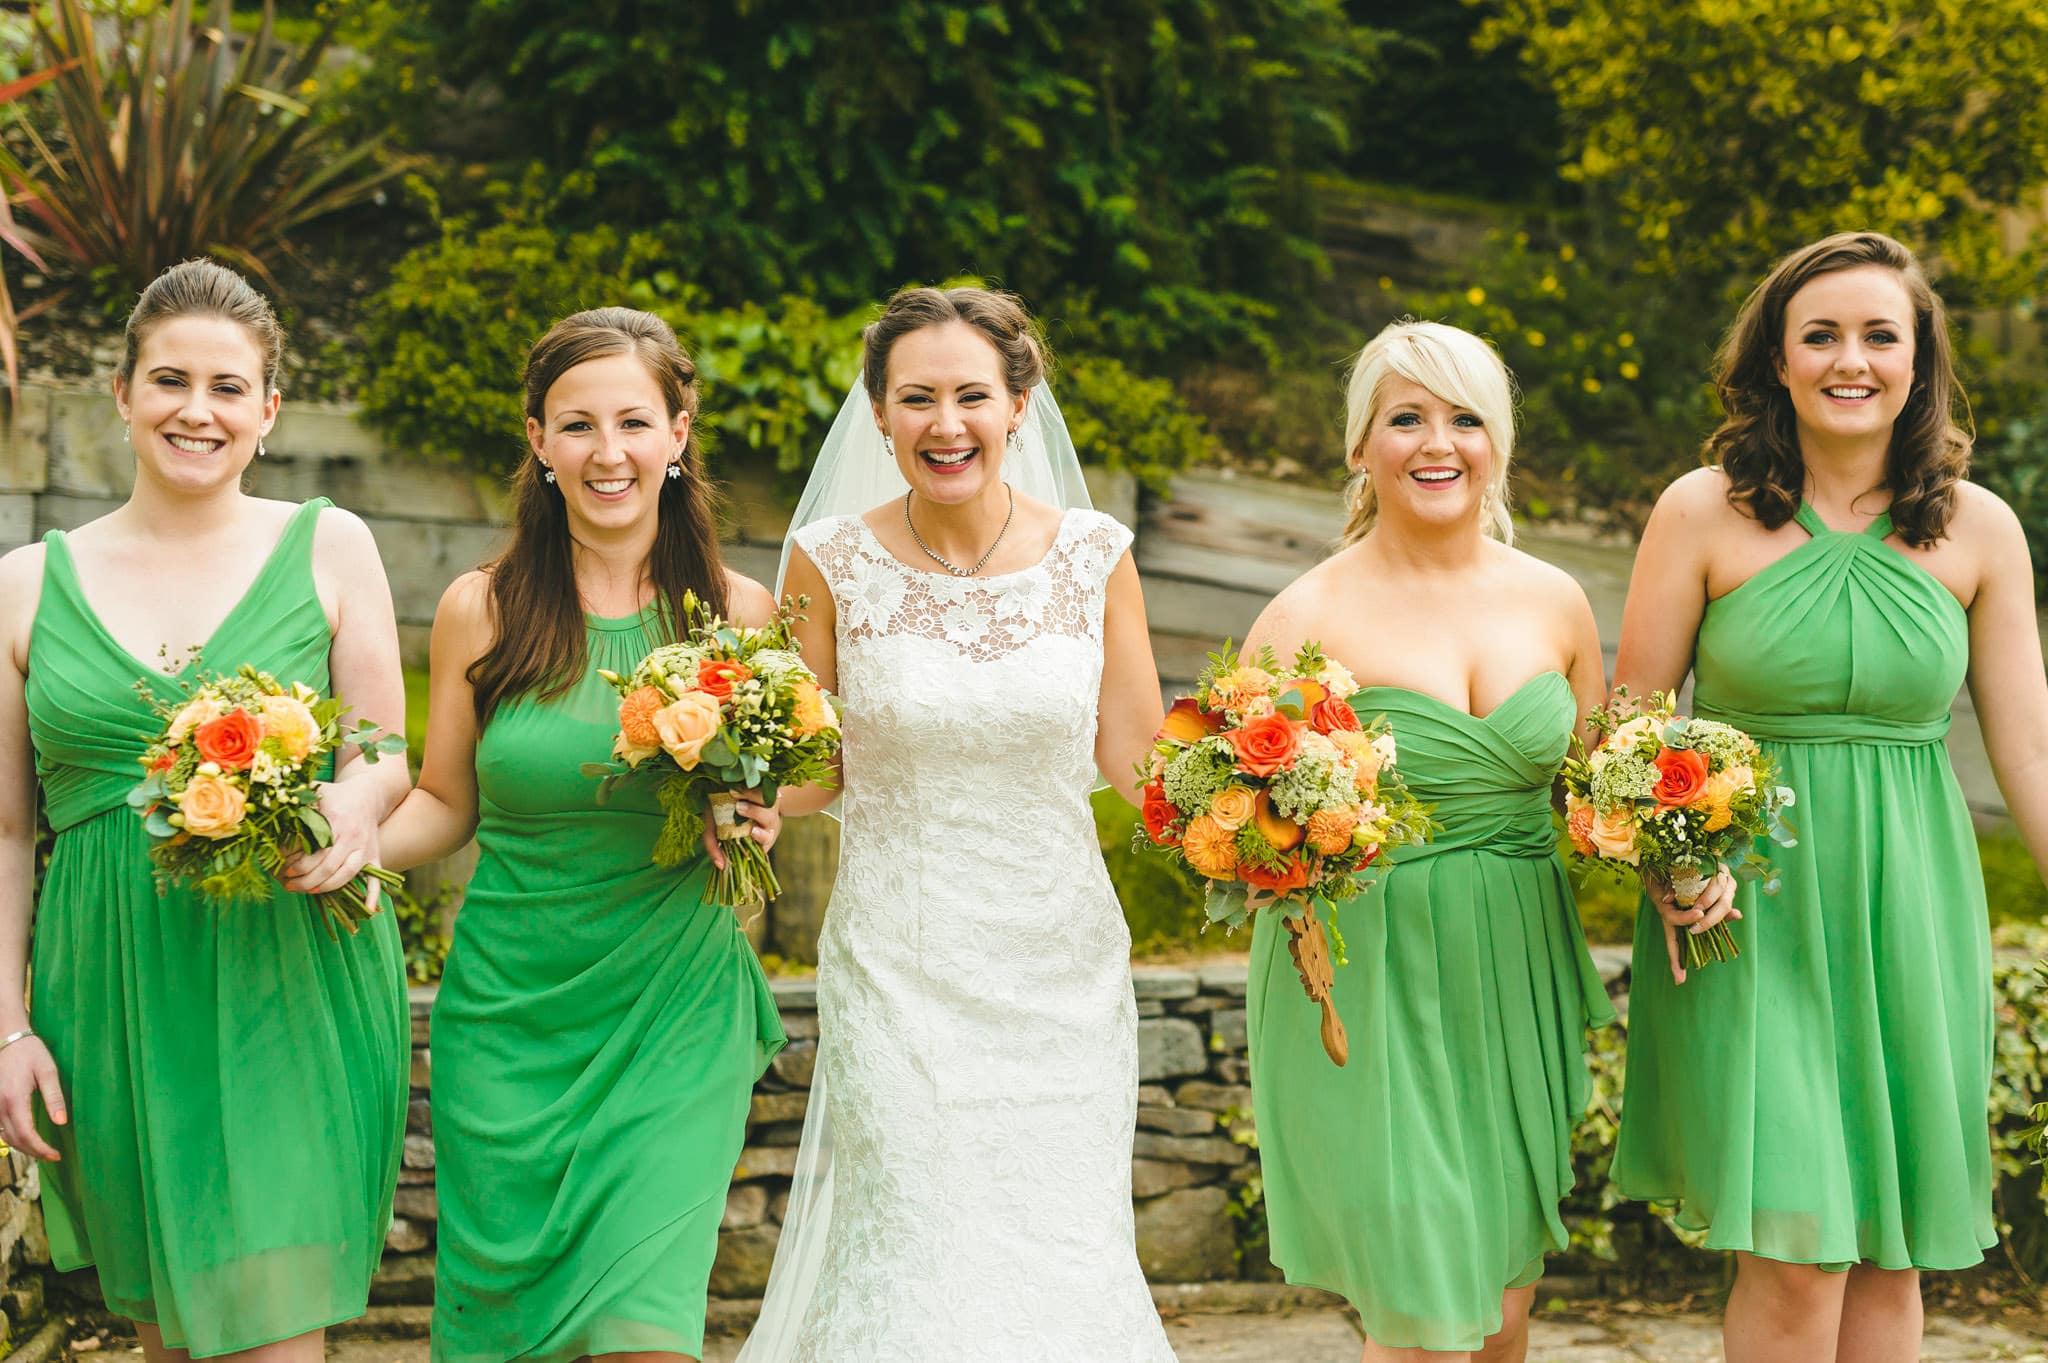 Wedding photography at Y Talbot Hotel in Tregaron, Wales   Tina + Phil 57